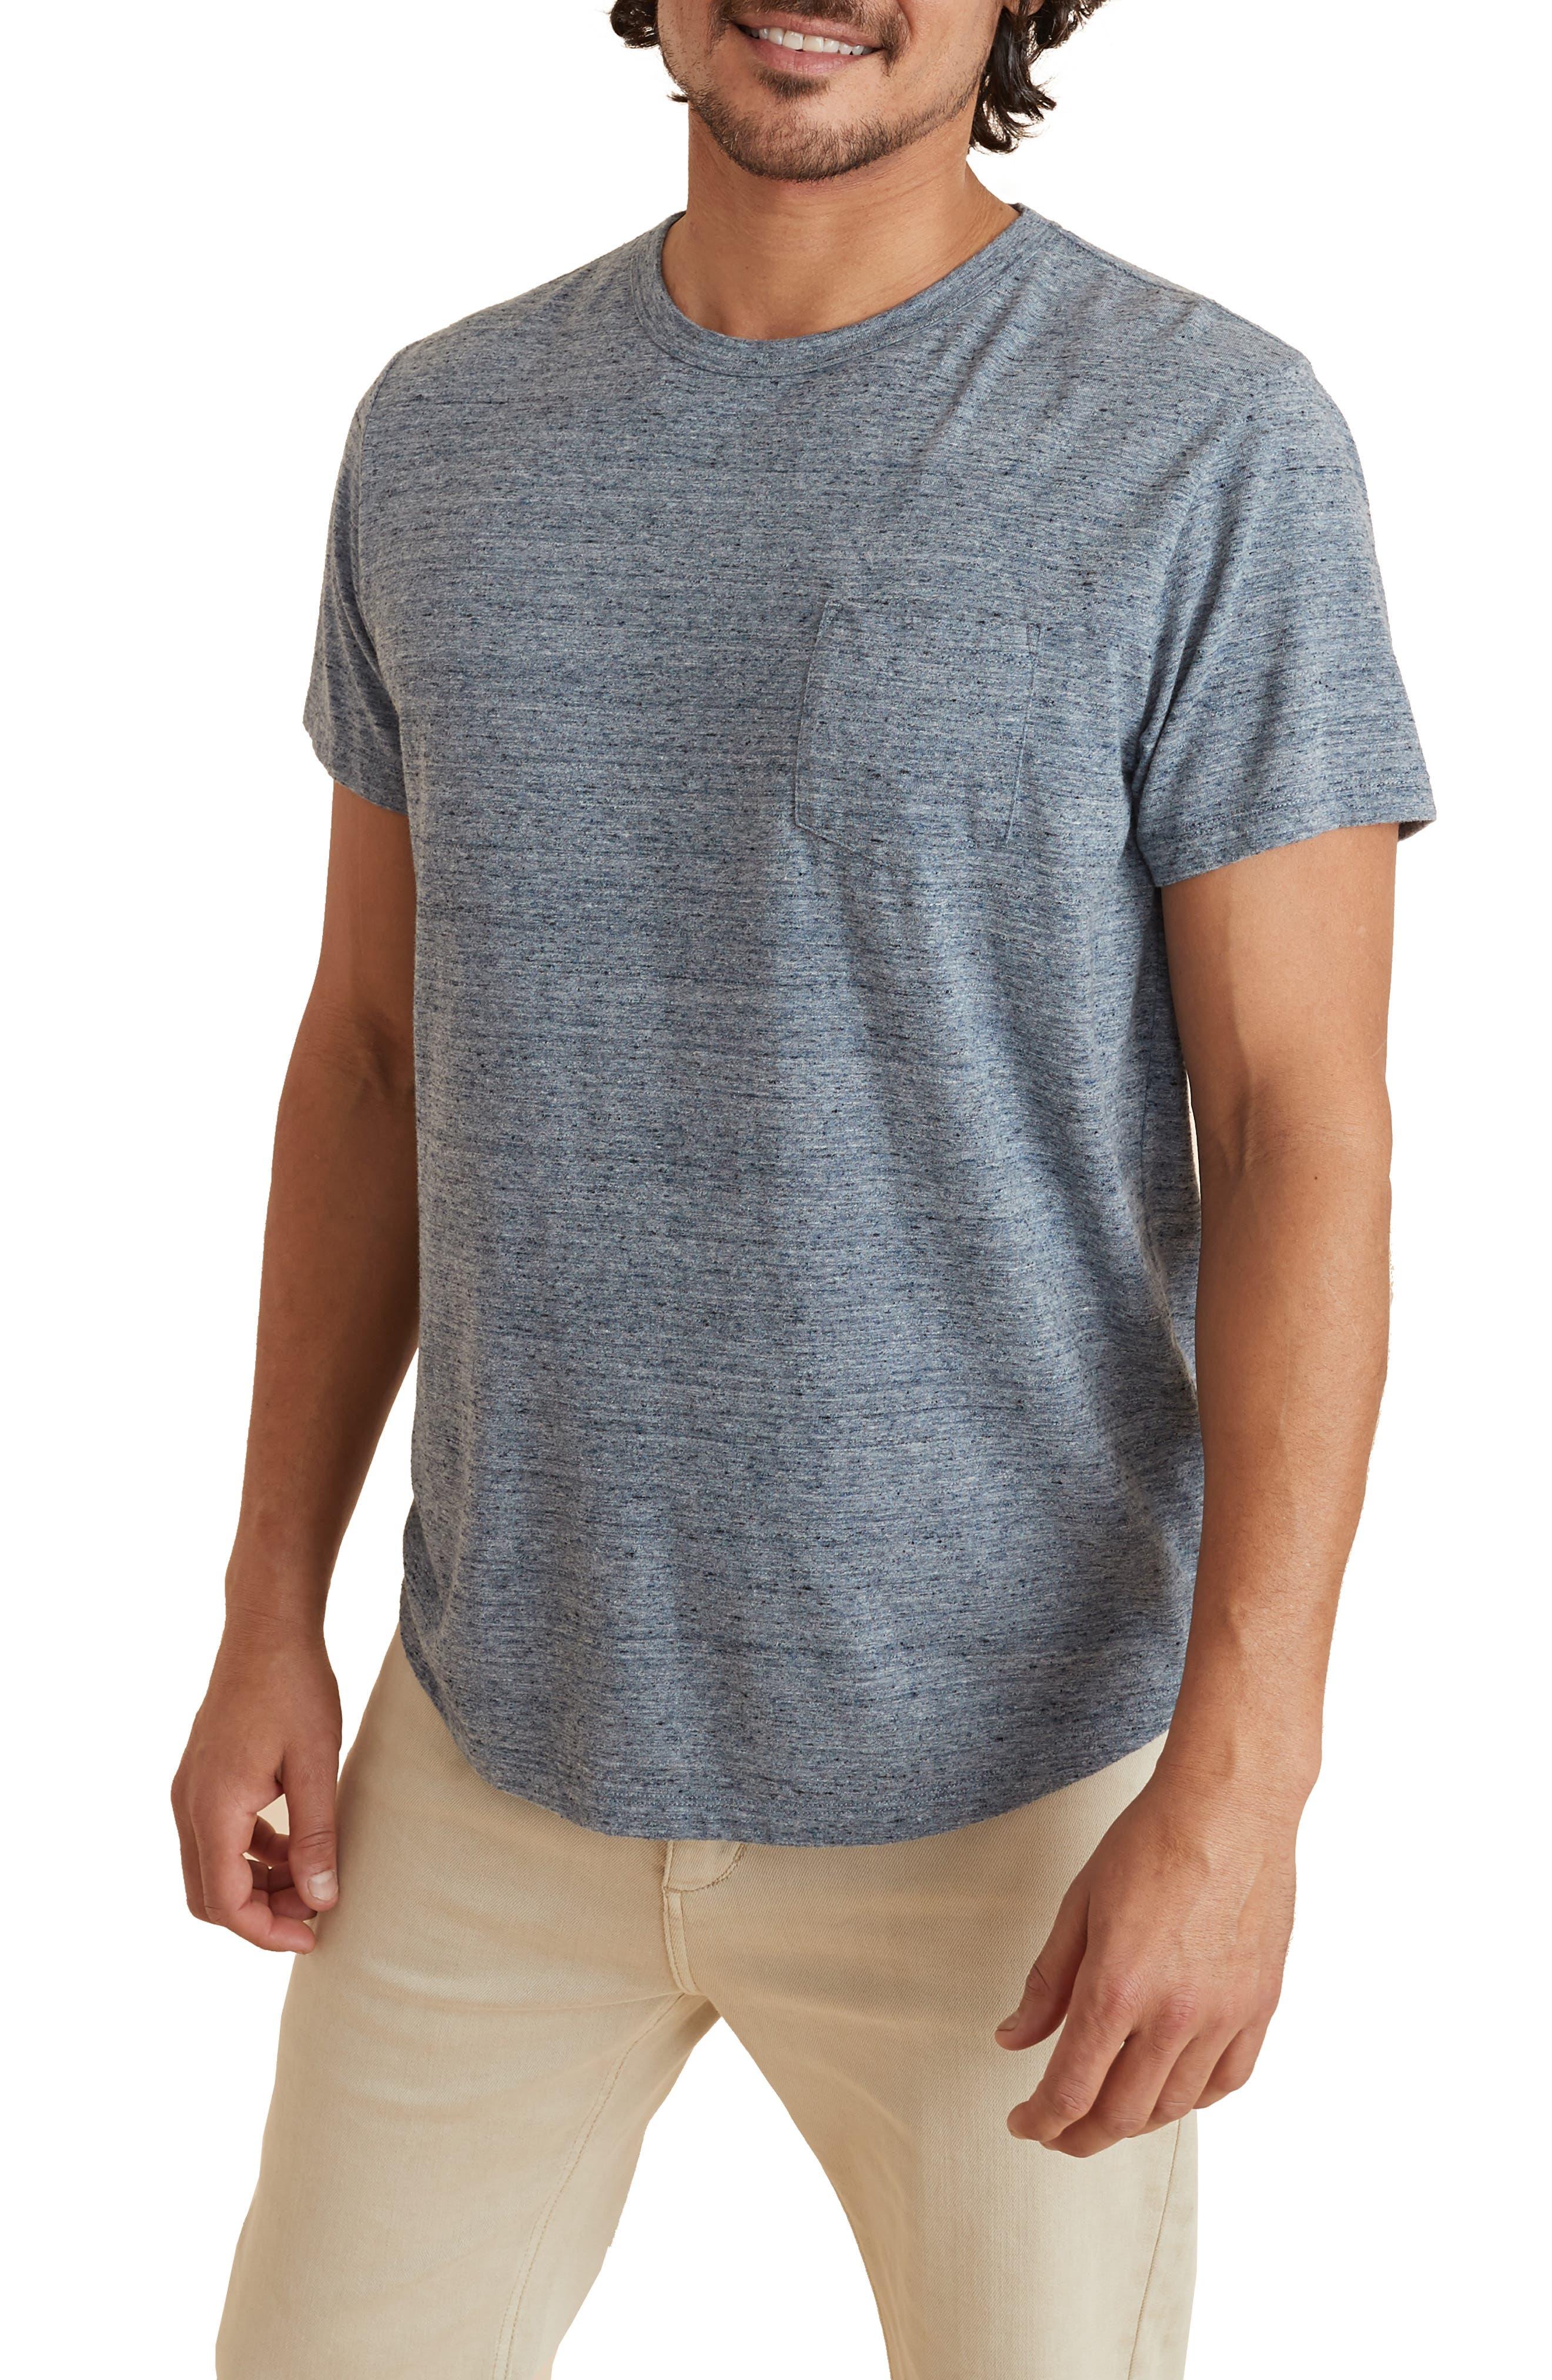 Re-Spun Saddle Hem Pocket T-Shirt